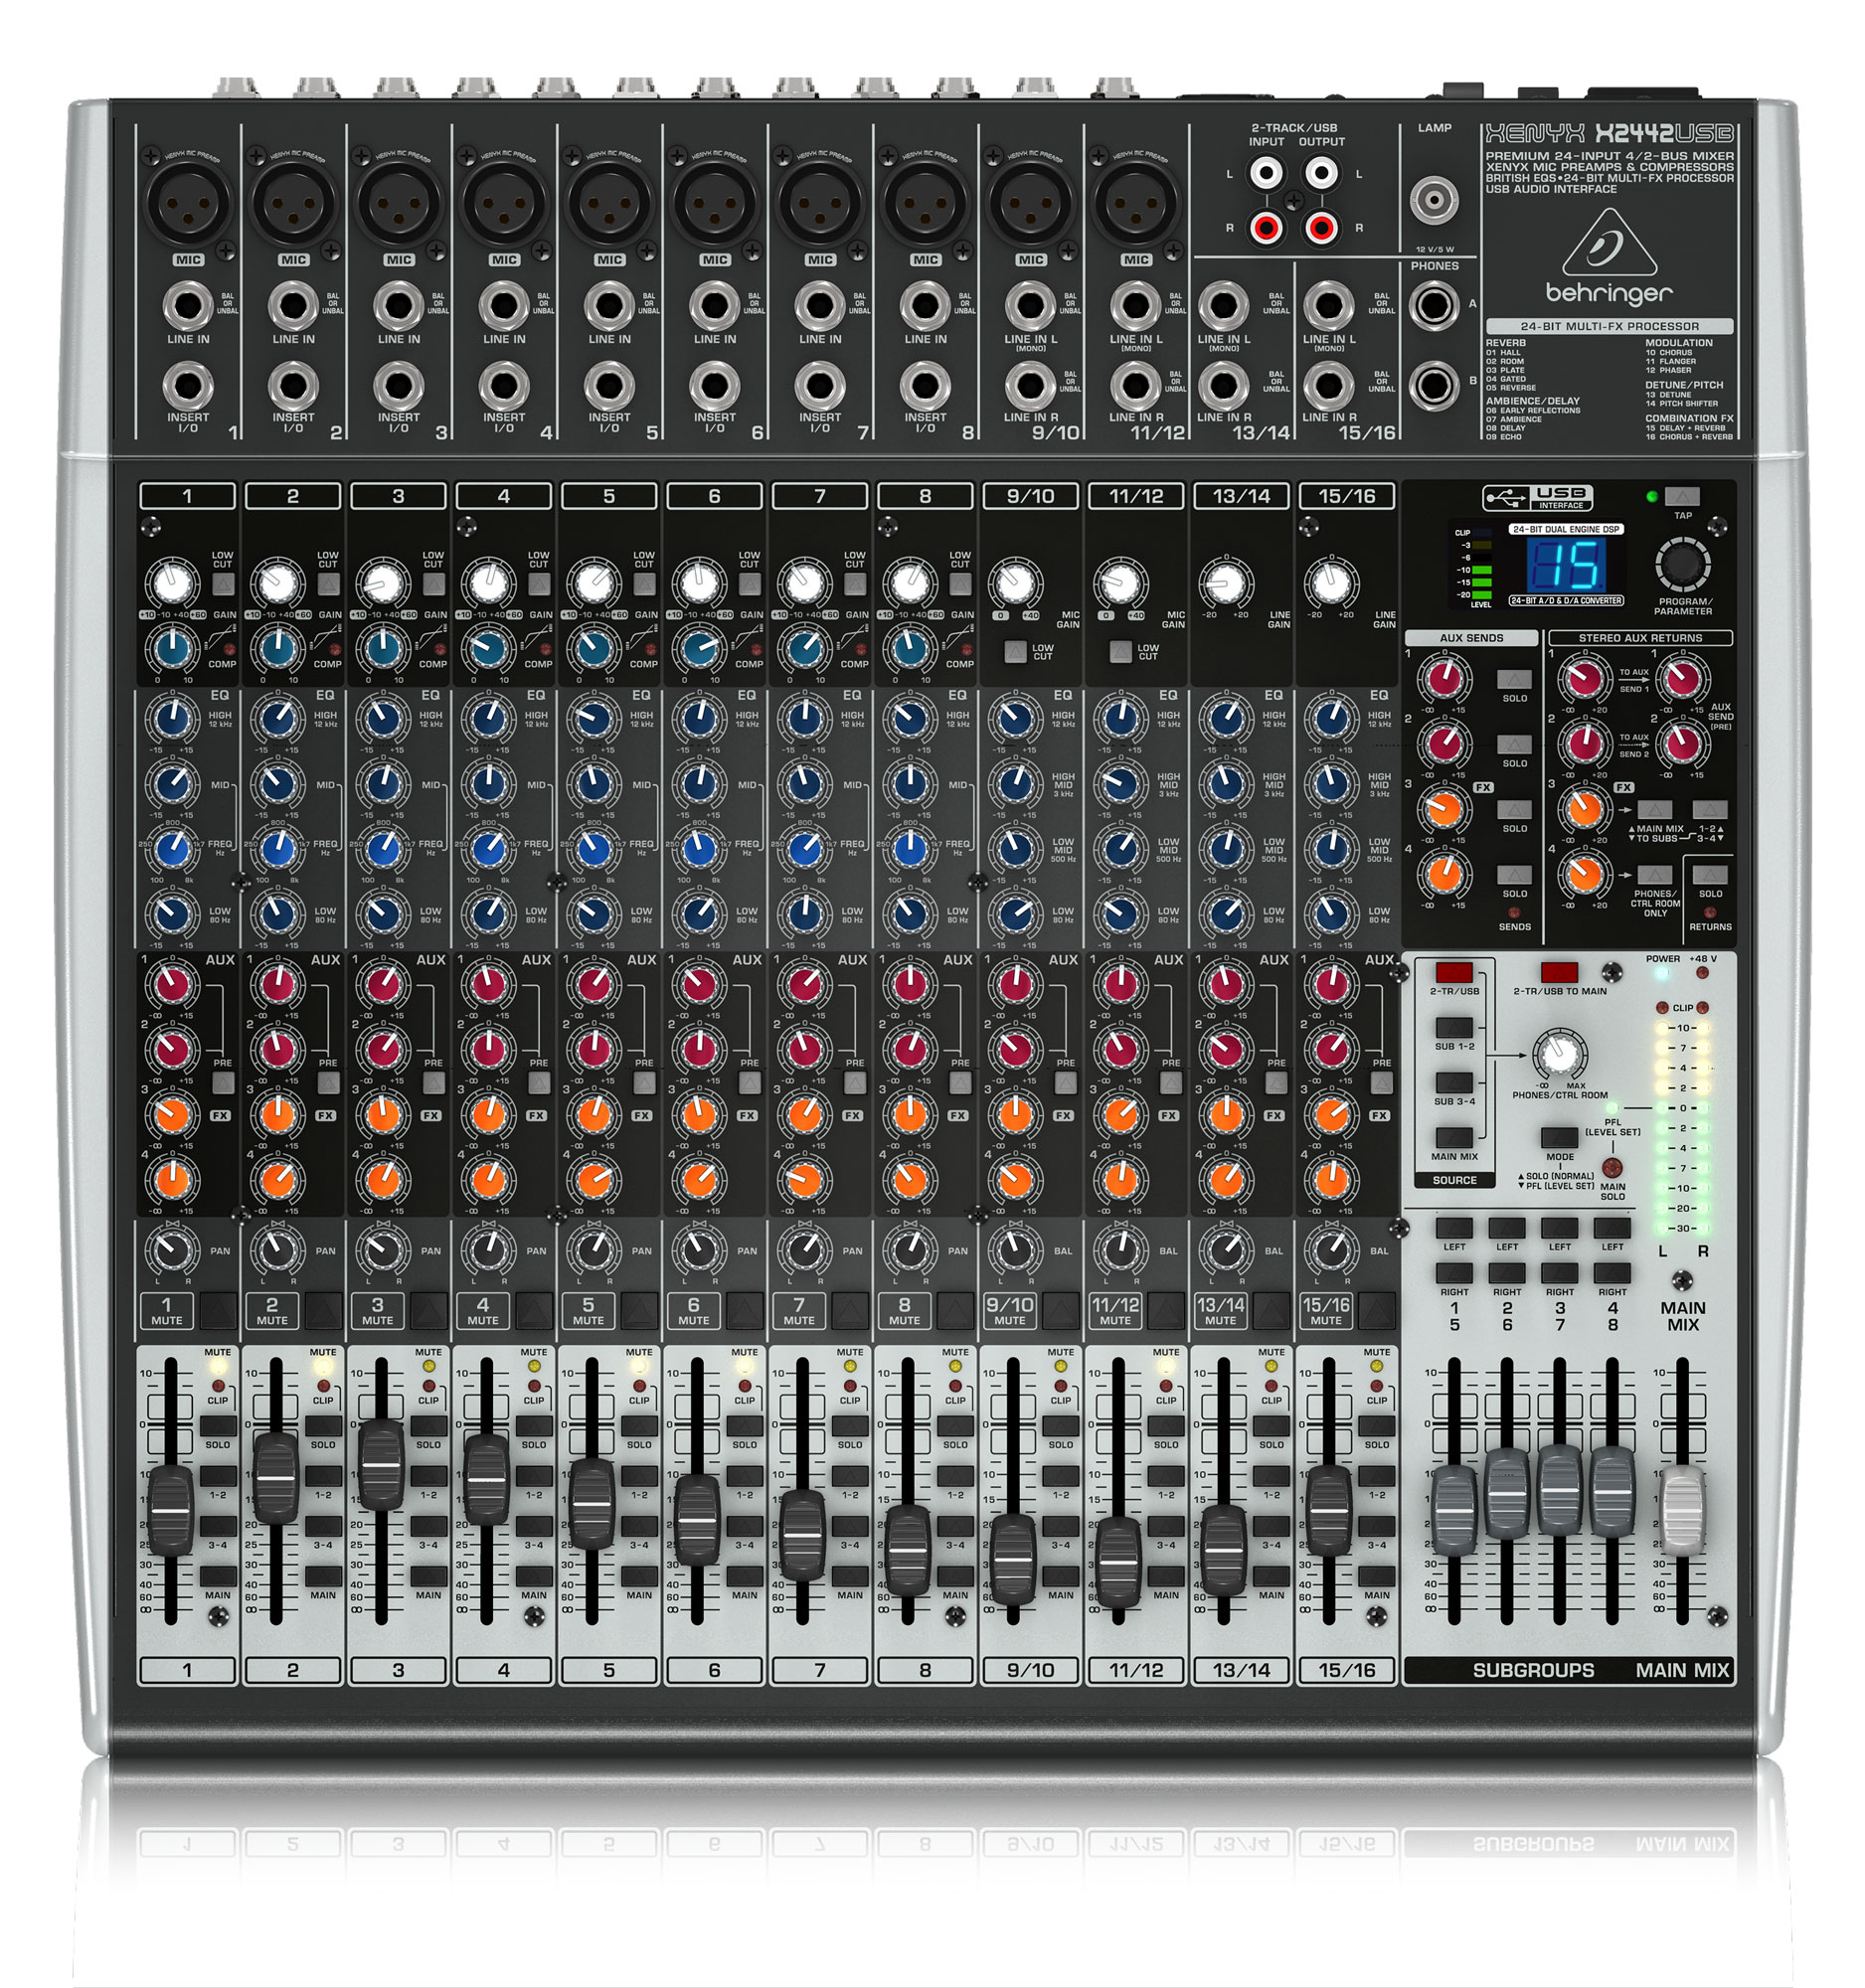 Mischpulte - Behringer Xenyx X2442 USB Mischpult - Onlineshop Musikhaus Kirstein